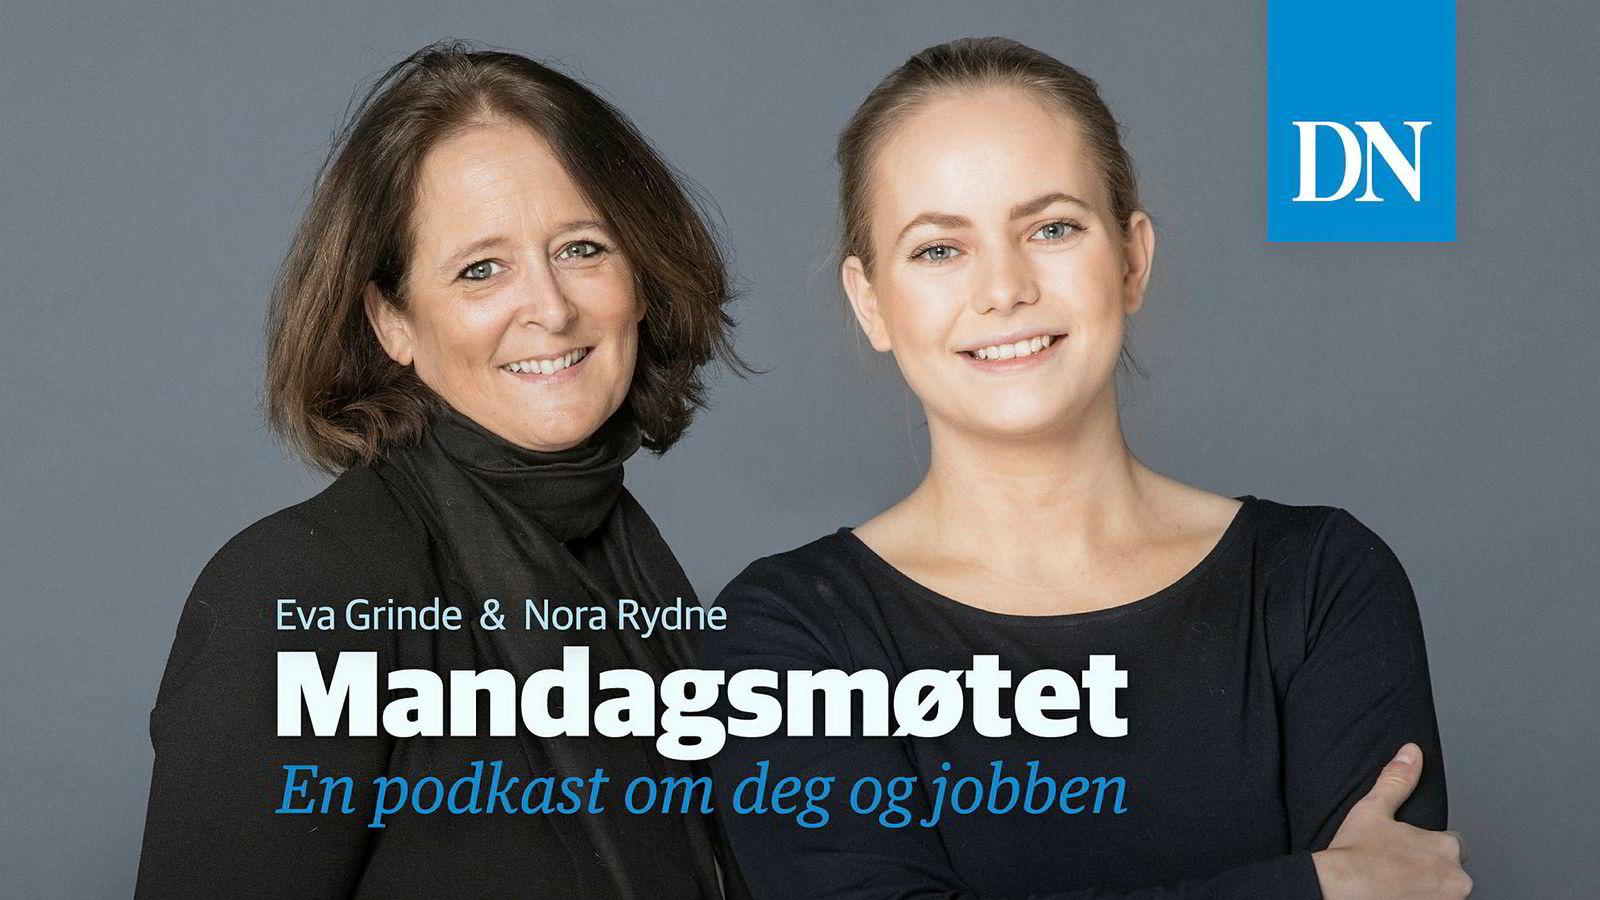 Dagens Næringslivs nye podkast: Mandagsmøtet med Eva Grinde og Nora Rydne